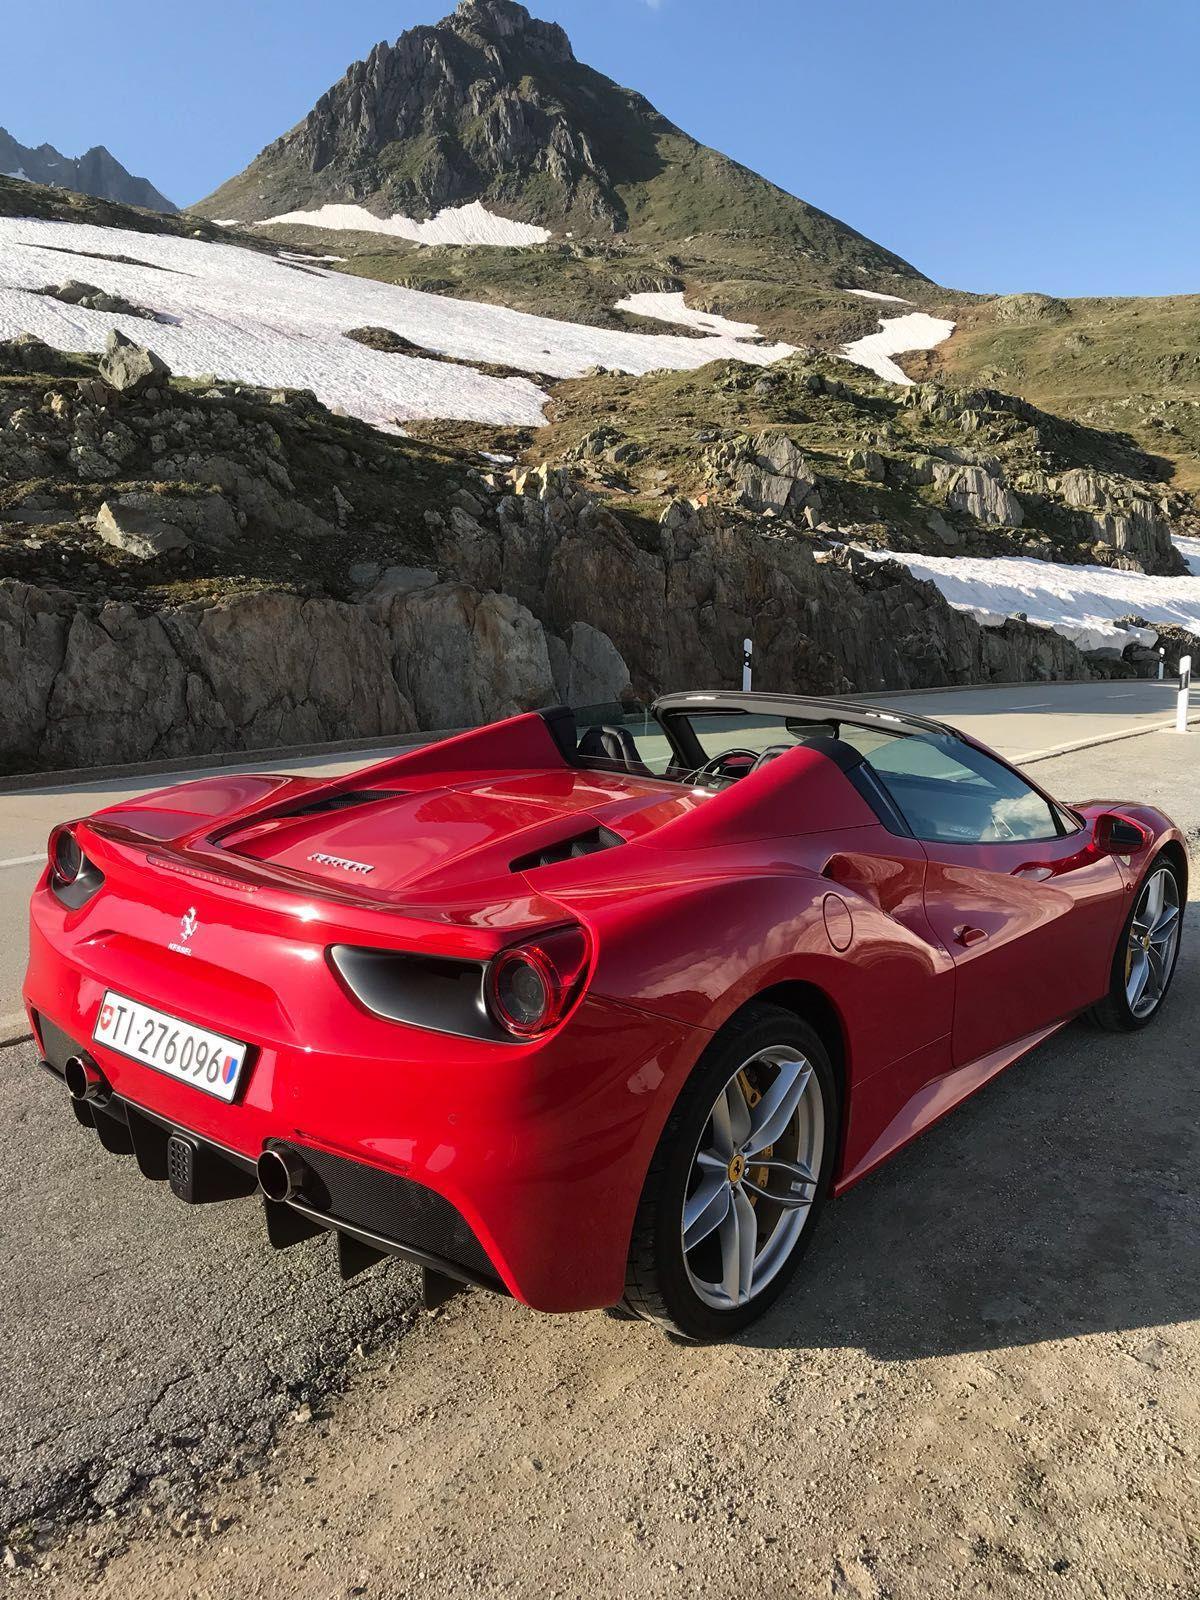 A Ferrari Will Always Take You To The Top Ferrari Spider Sportscar Convertible Luxurycar Rent Swiss Car Travel Italian Sportwagen